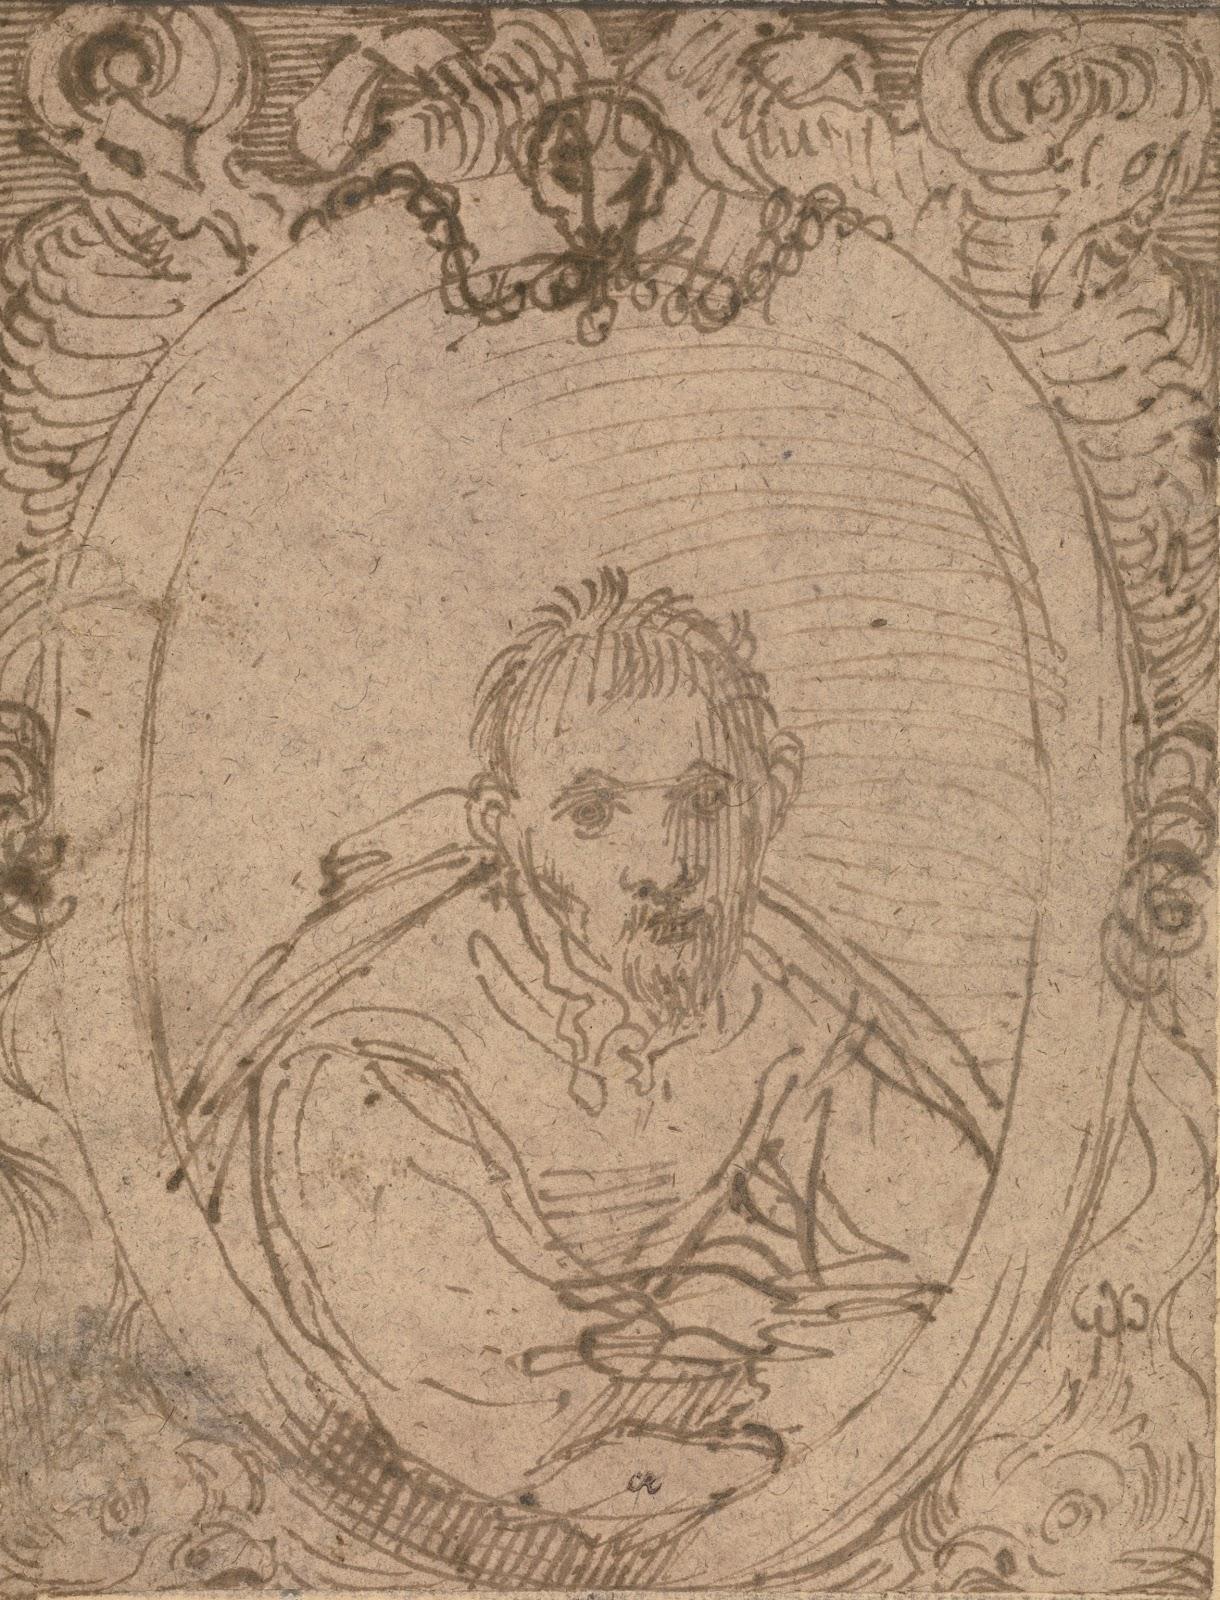 Annibale carracci baroque era painter part tutt for Famous artist in baroque period